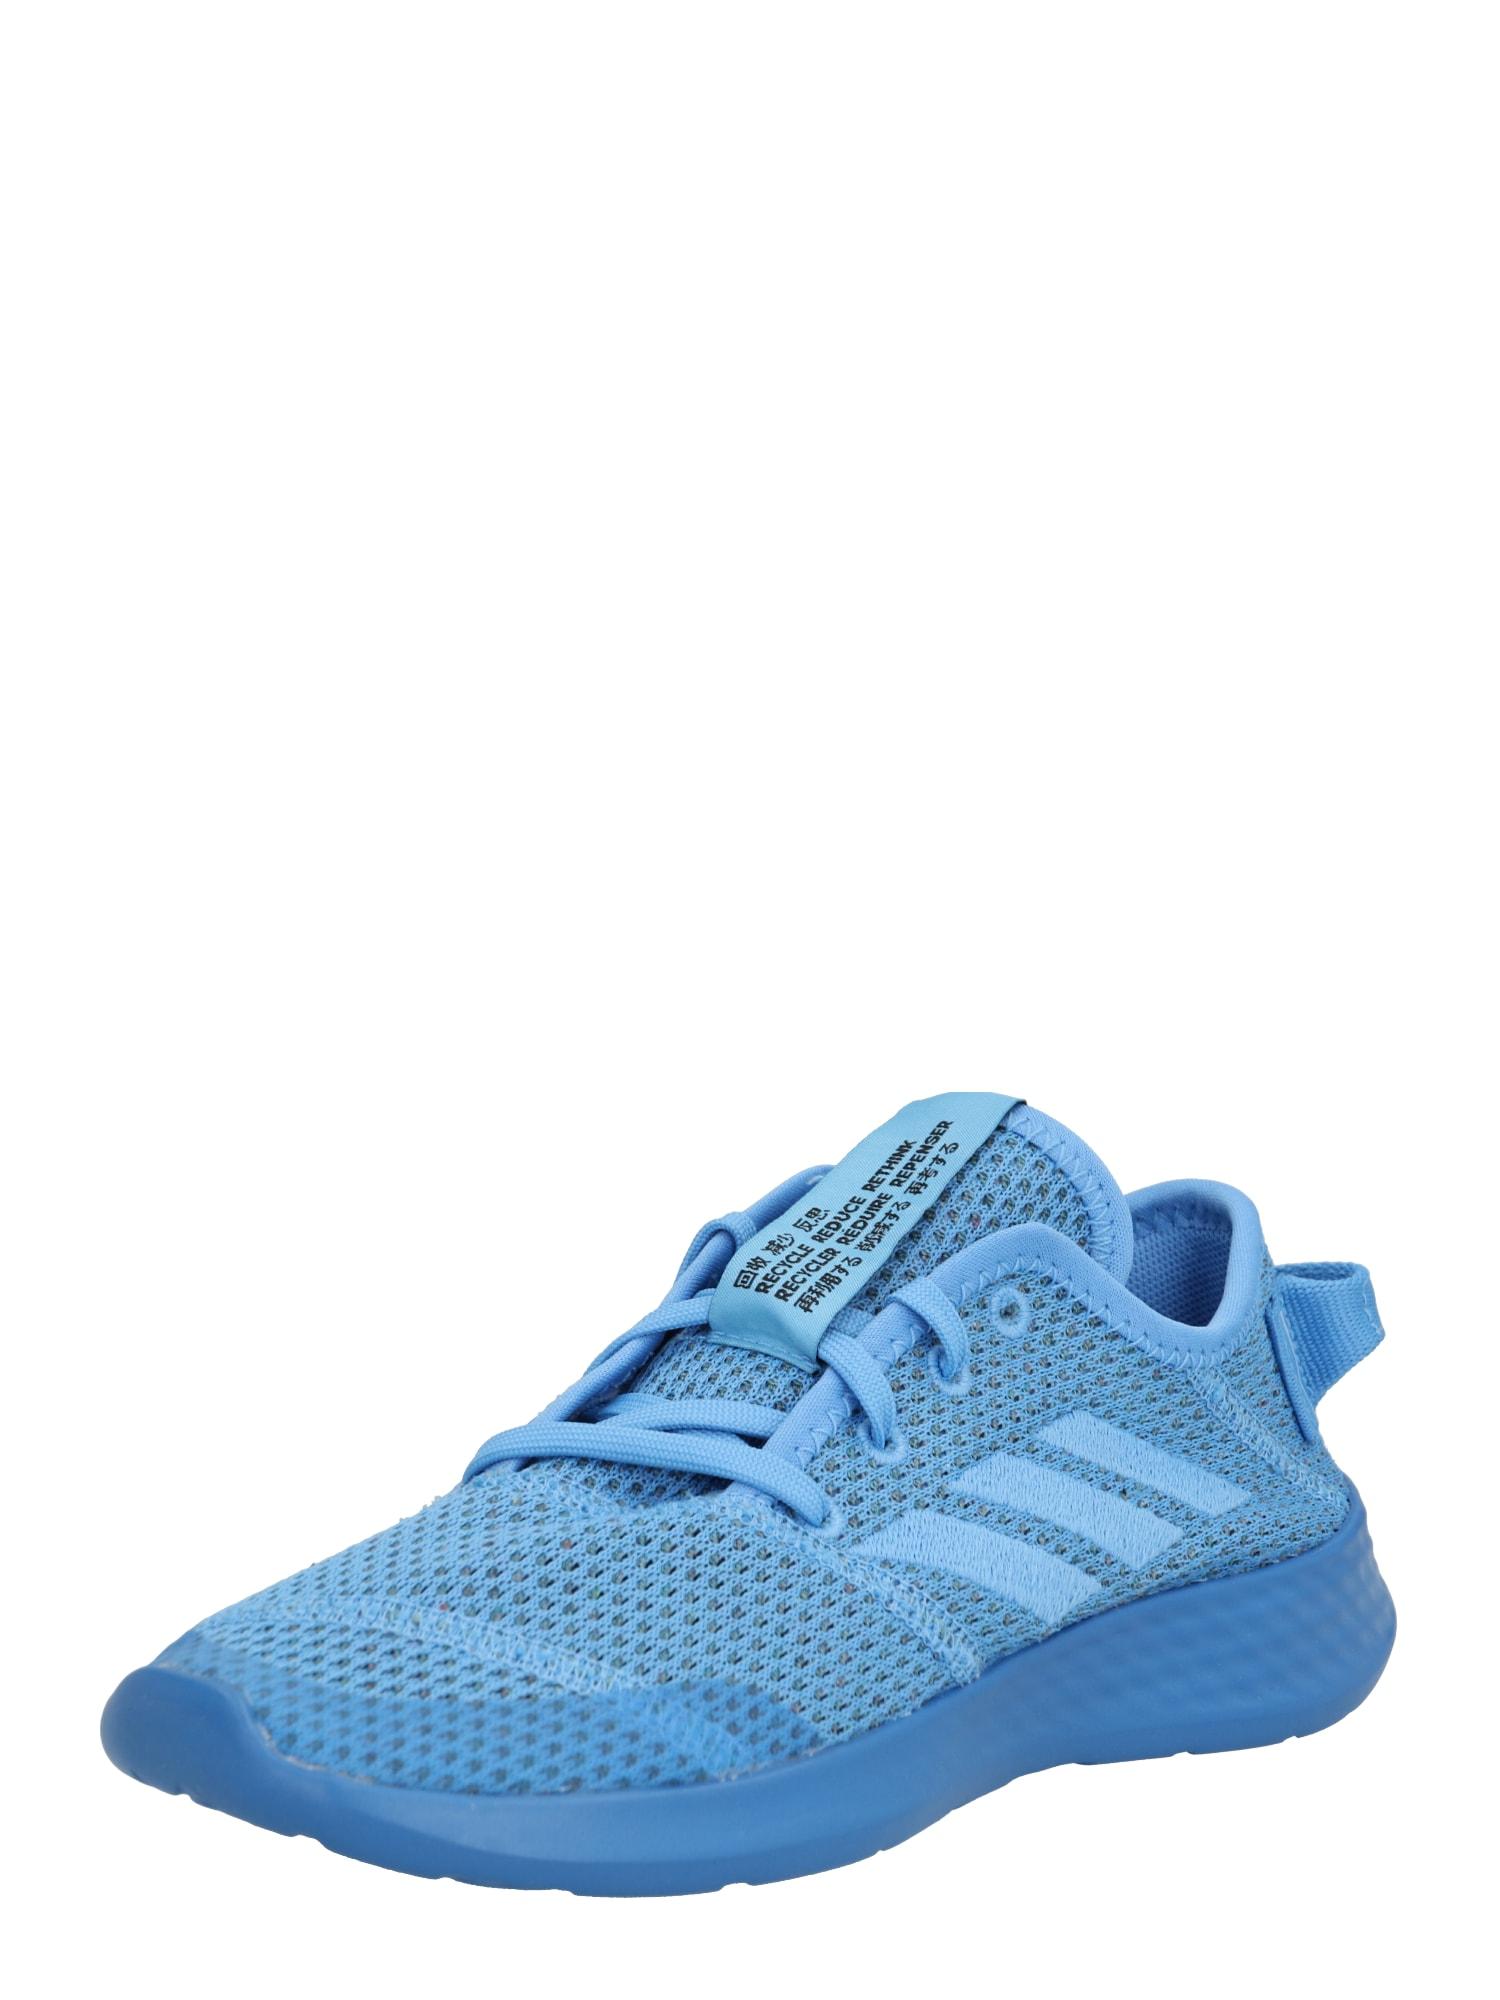 ADIDAS ORIGINALS Športová obuv 'Forta Refine'  dymovo modrá